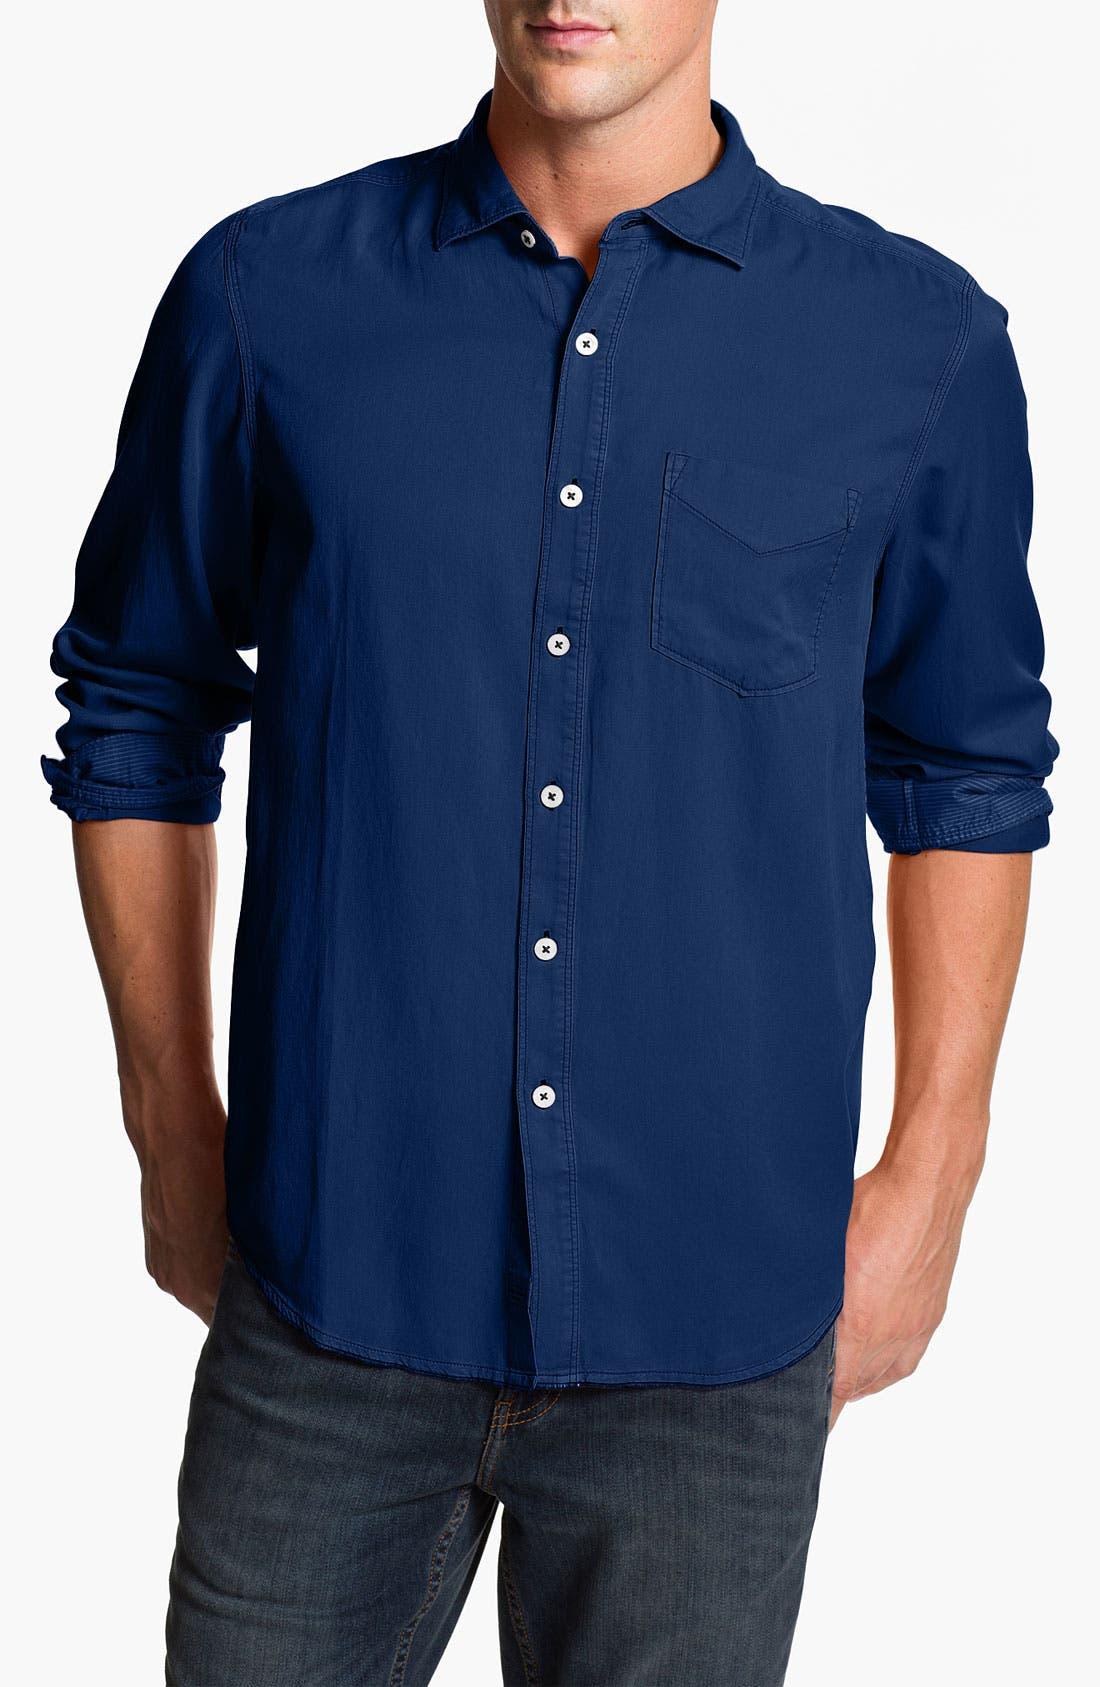 Alternate Image 1 Selected - Tommy Bahama Denim 'Still Twillin' Island Modern Fit Sport Shirt